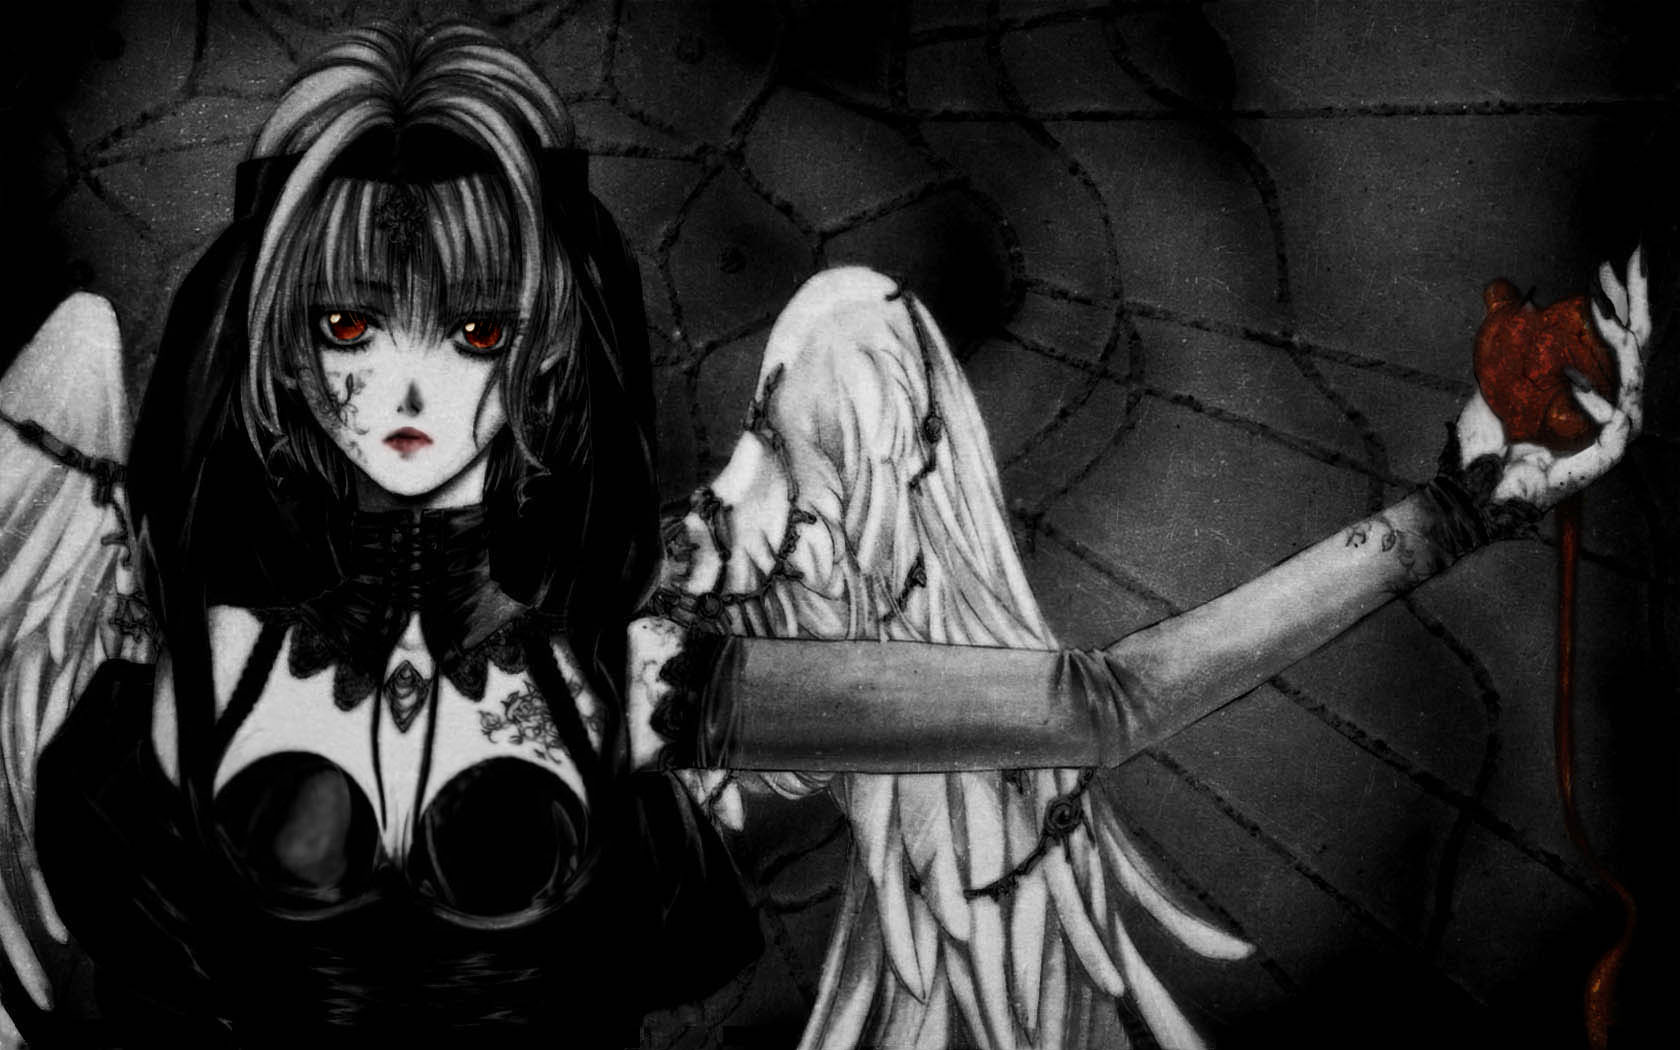 Black angel anime wallpaper wallpapersafari - Dark angel anime wallpaper ...